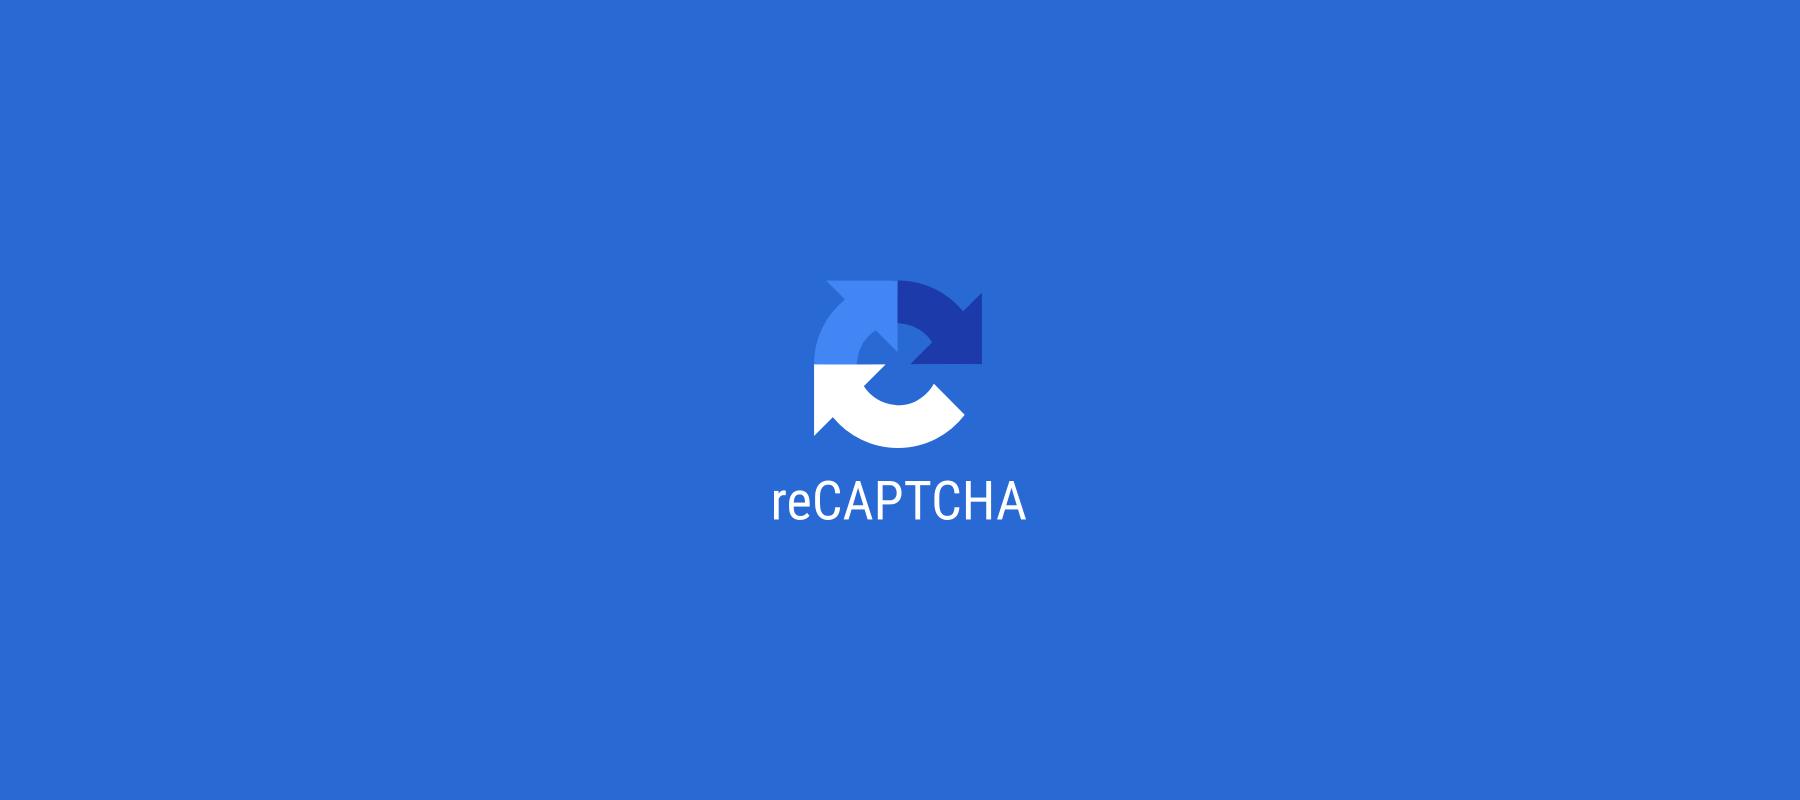 Fraud Prevention with Google reCAPTCHA